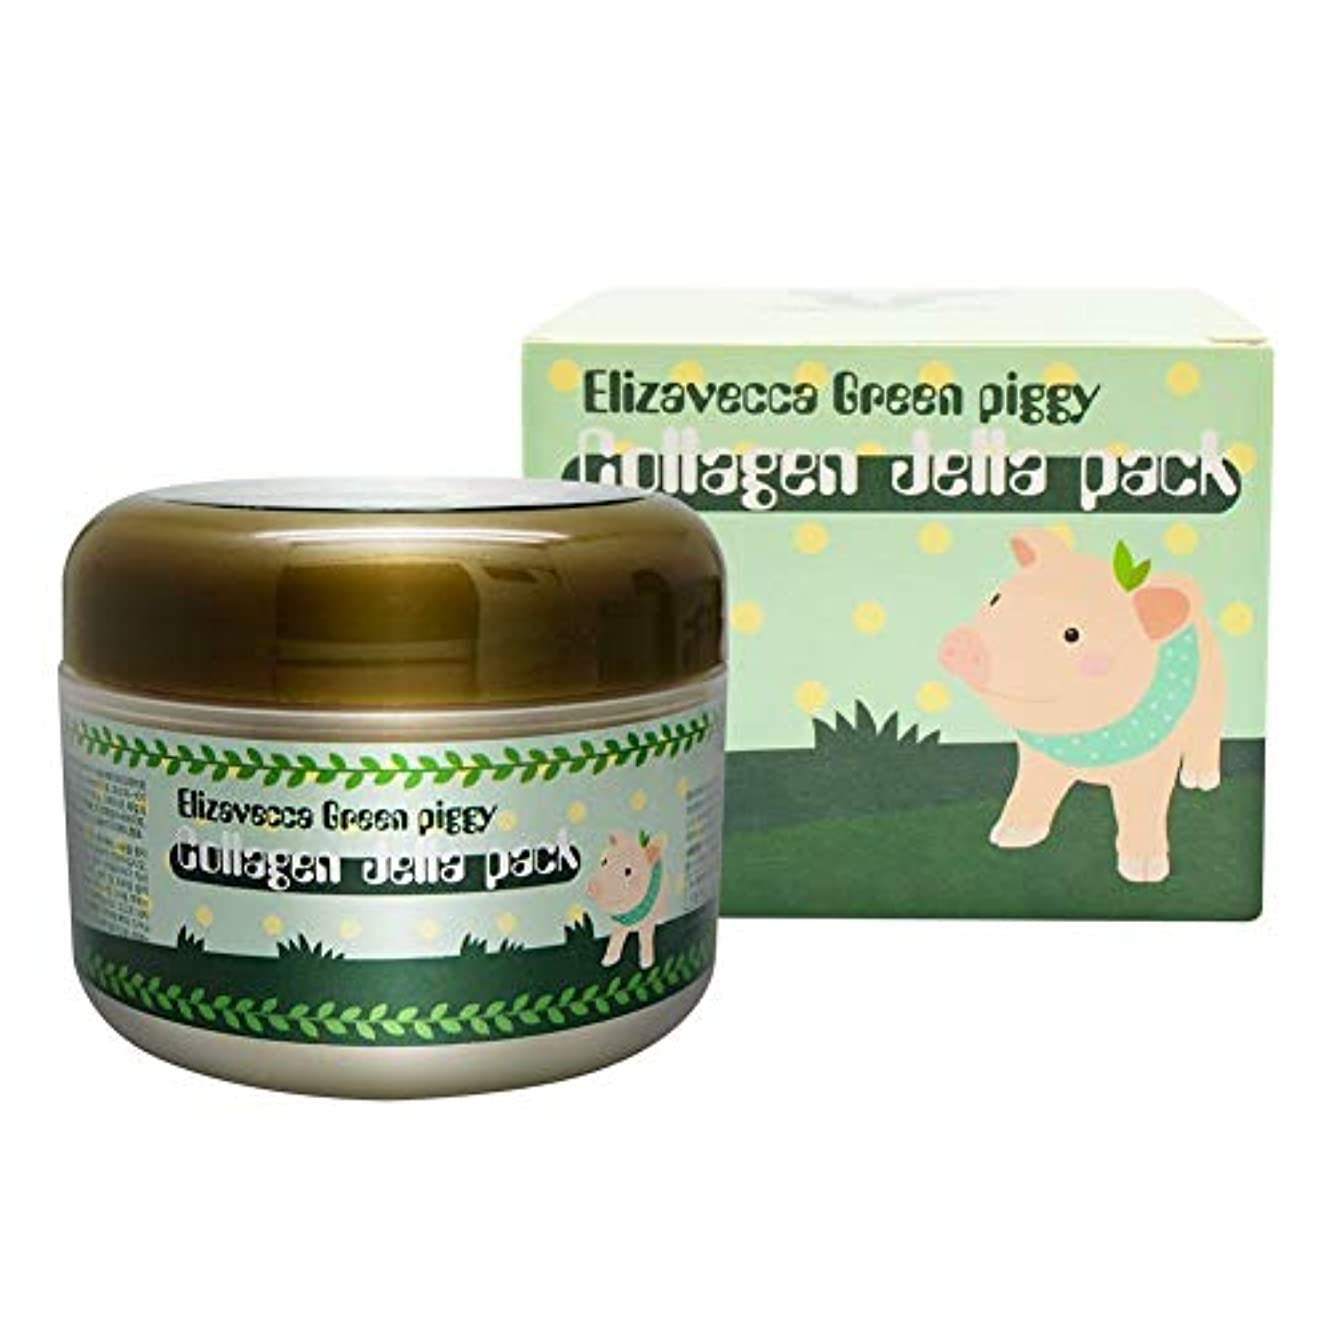 共和国繊細解説Elizavecca Green Piggy Collagen Jella Pack pig mask 100g